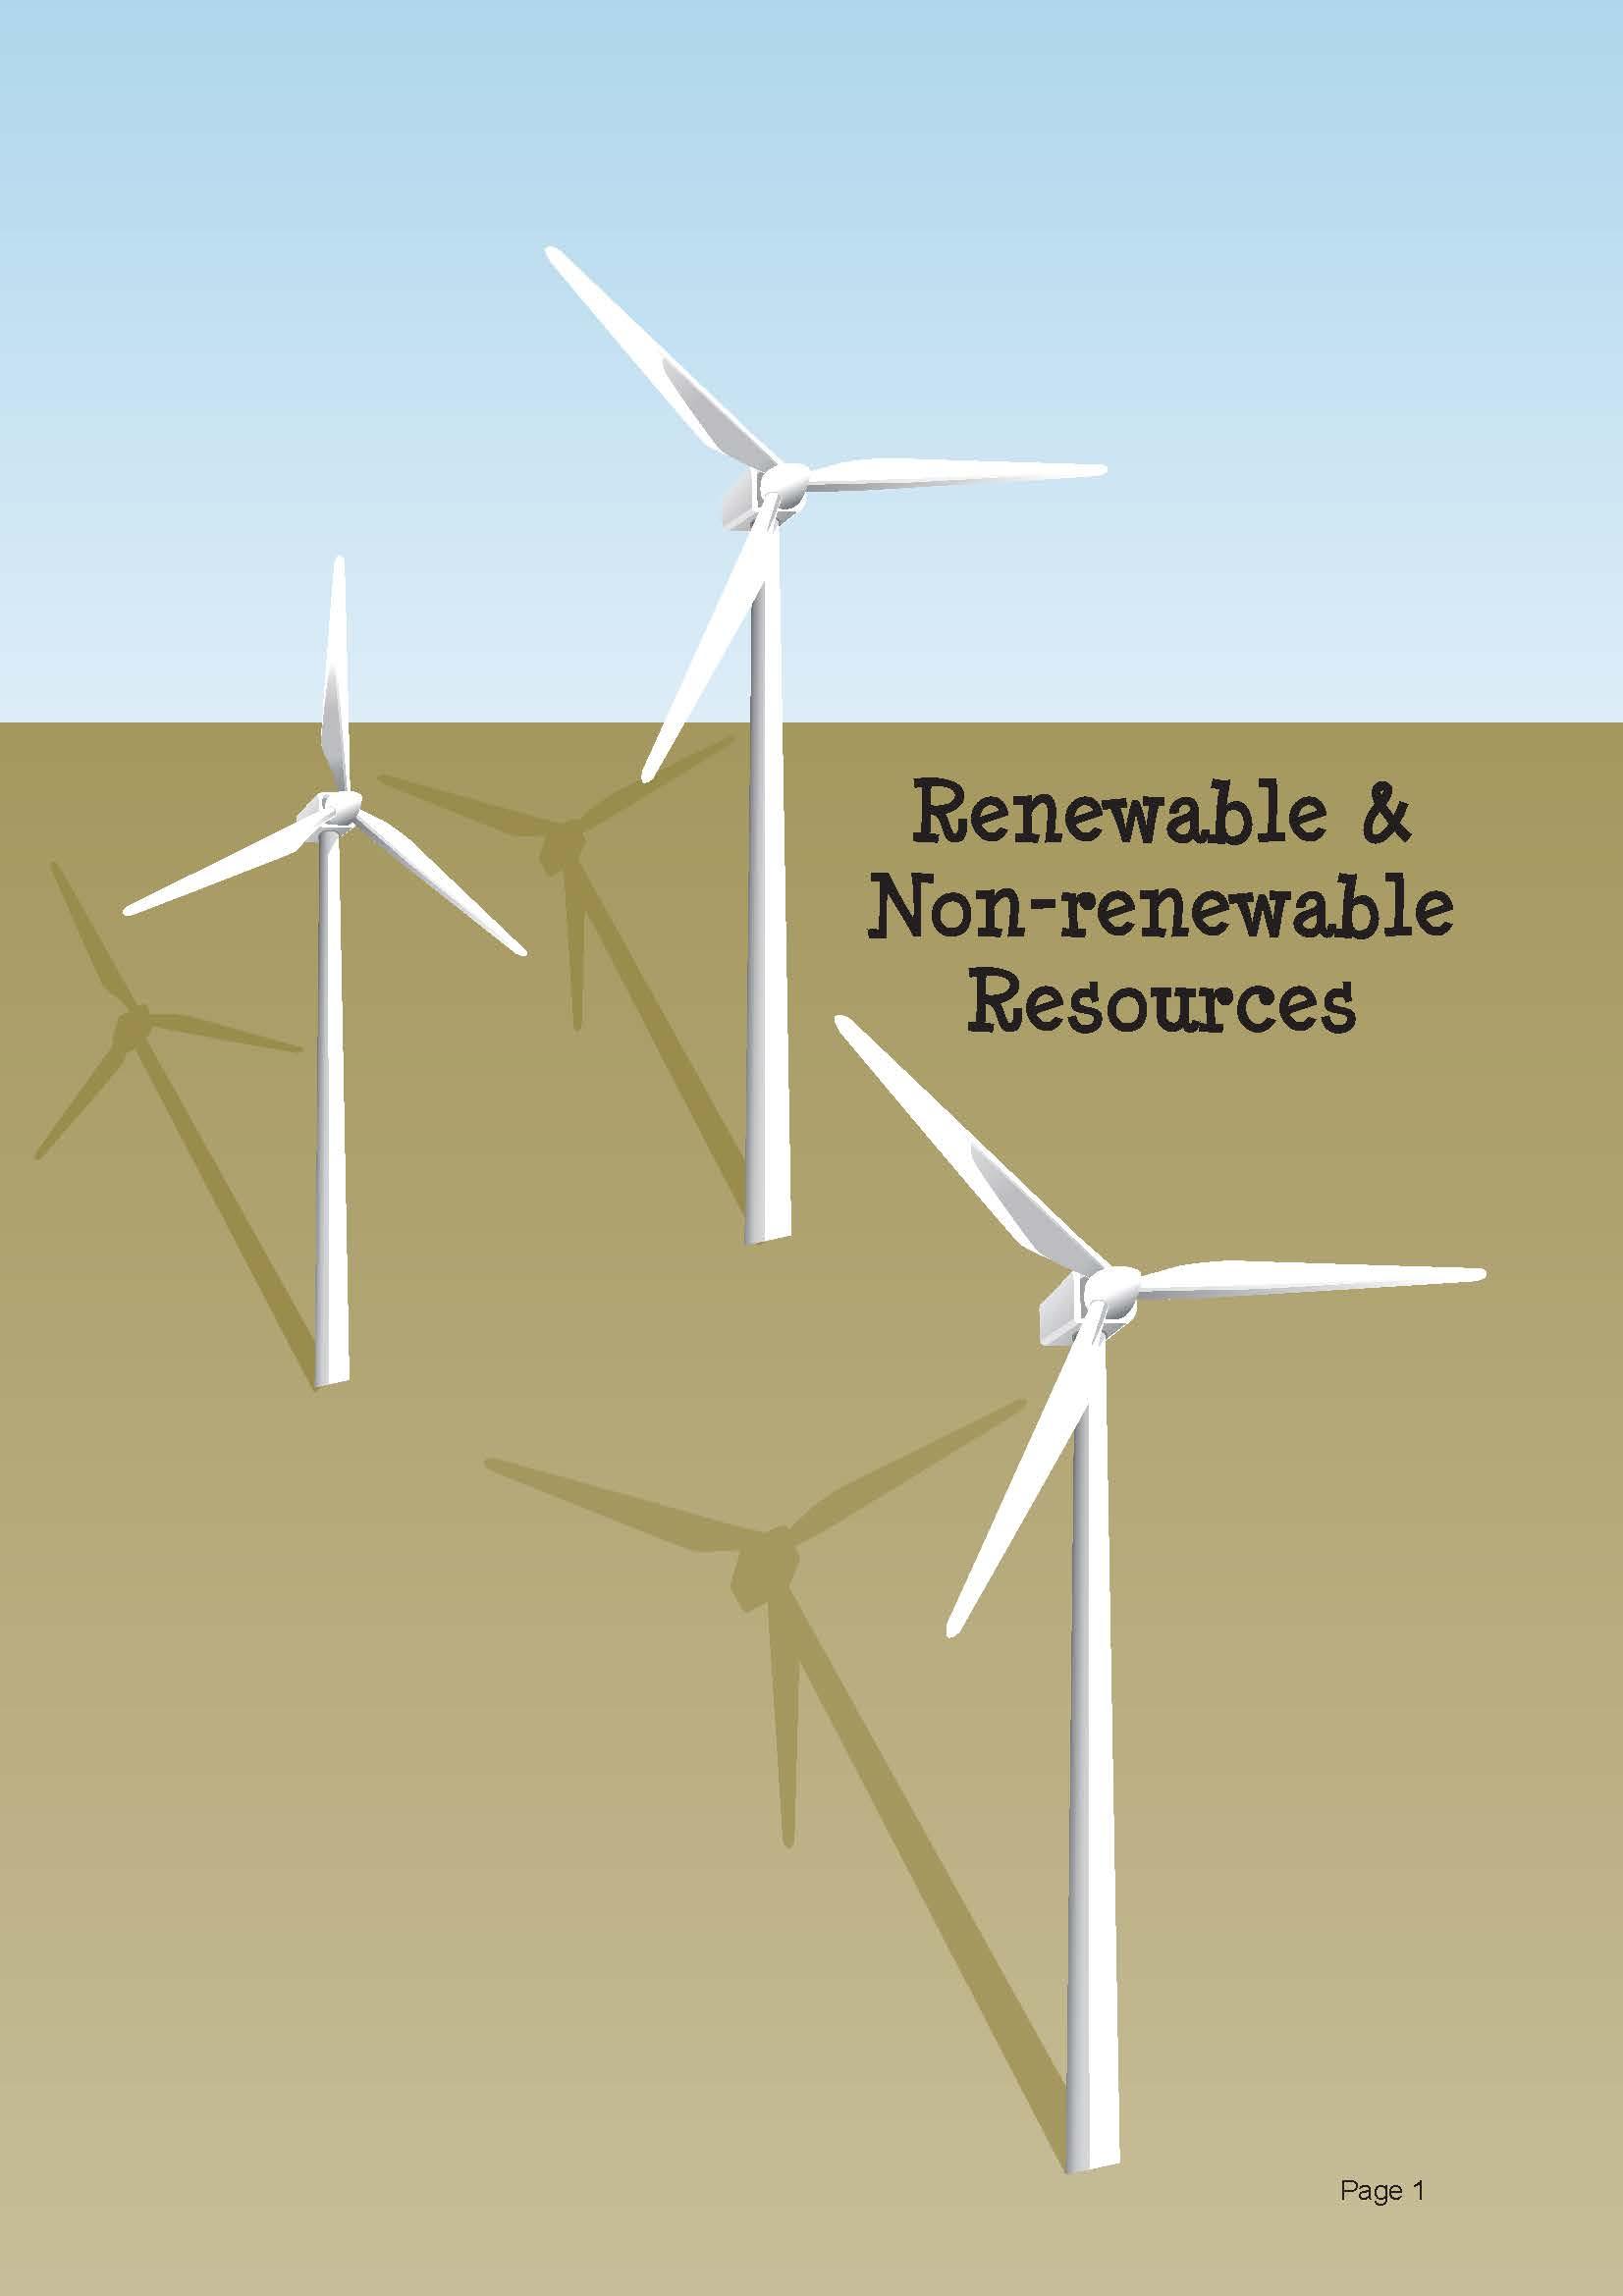 Renewable & Non-renewable Resources